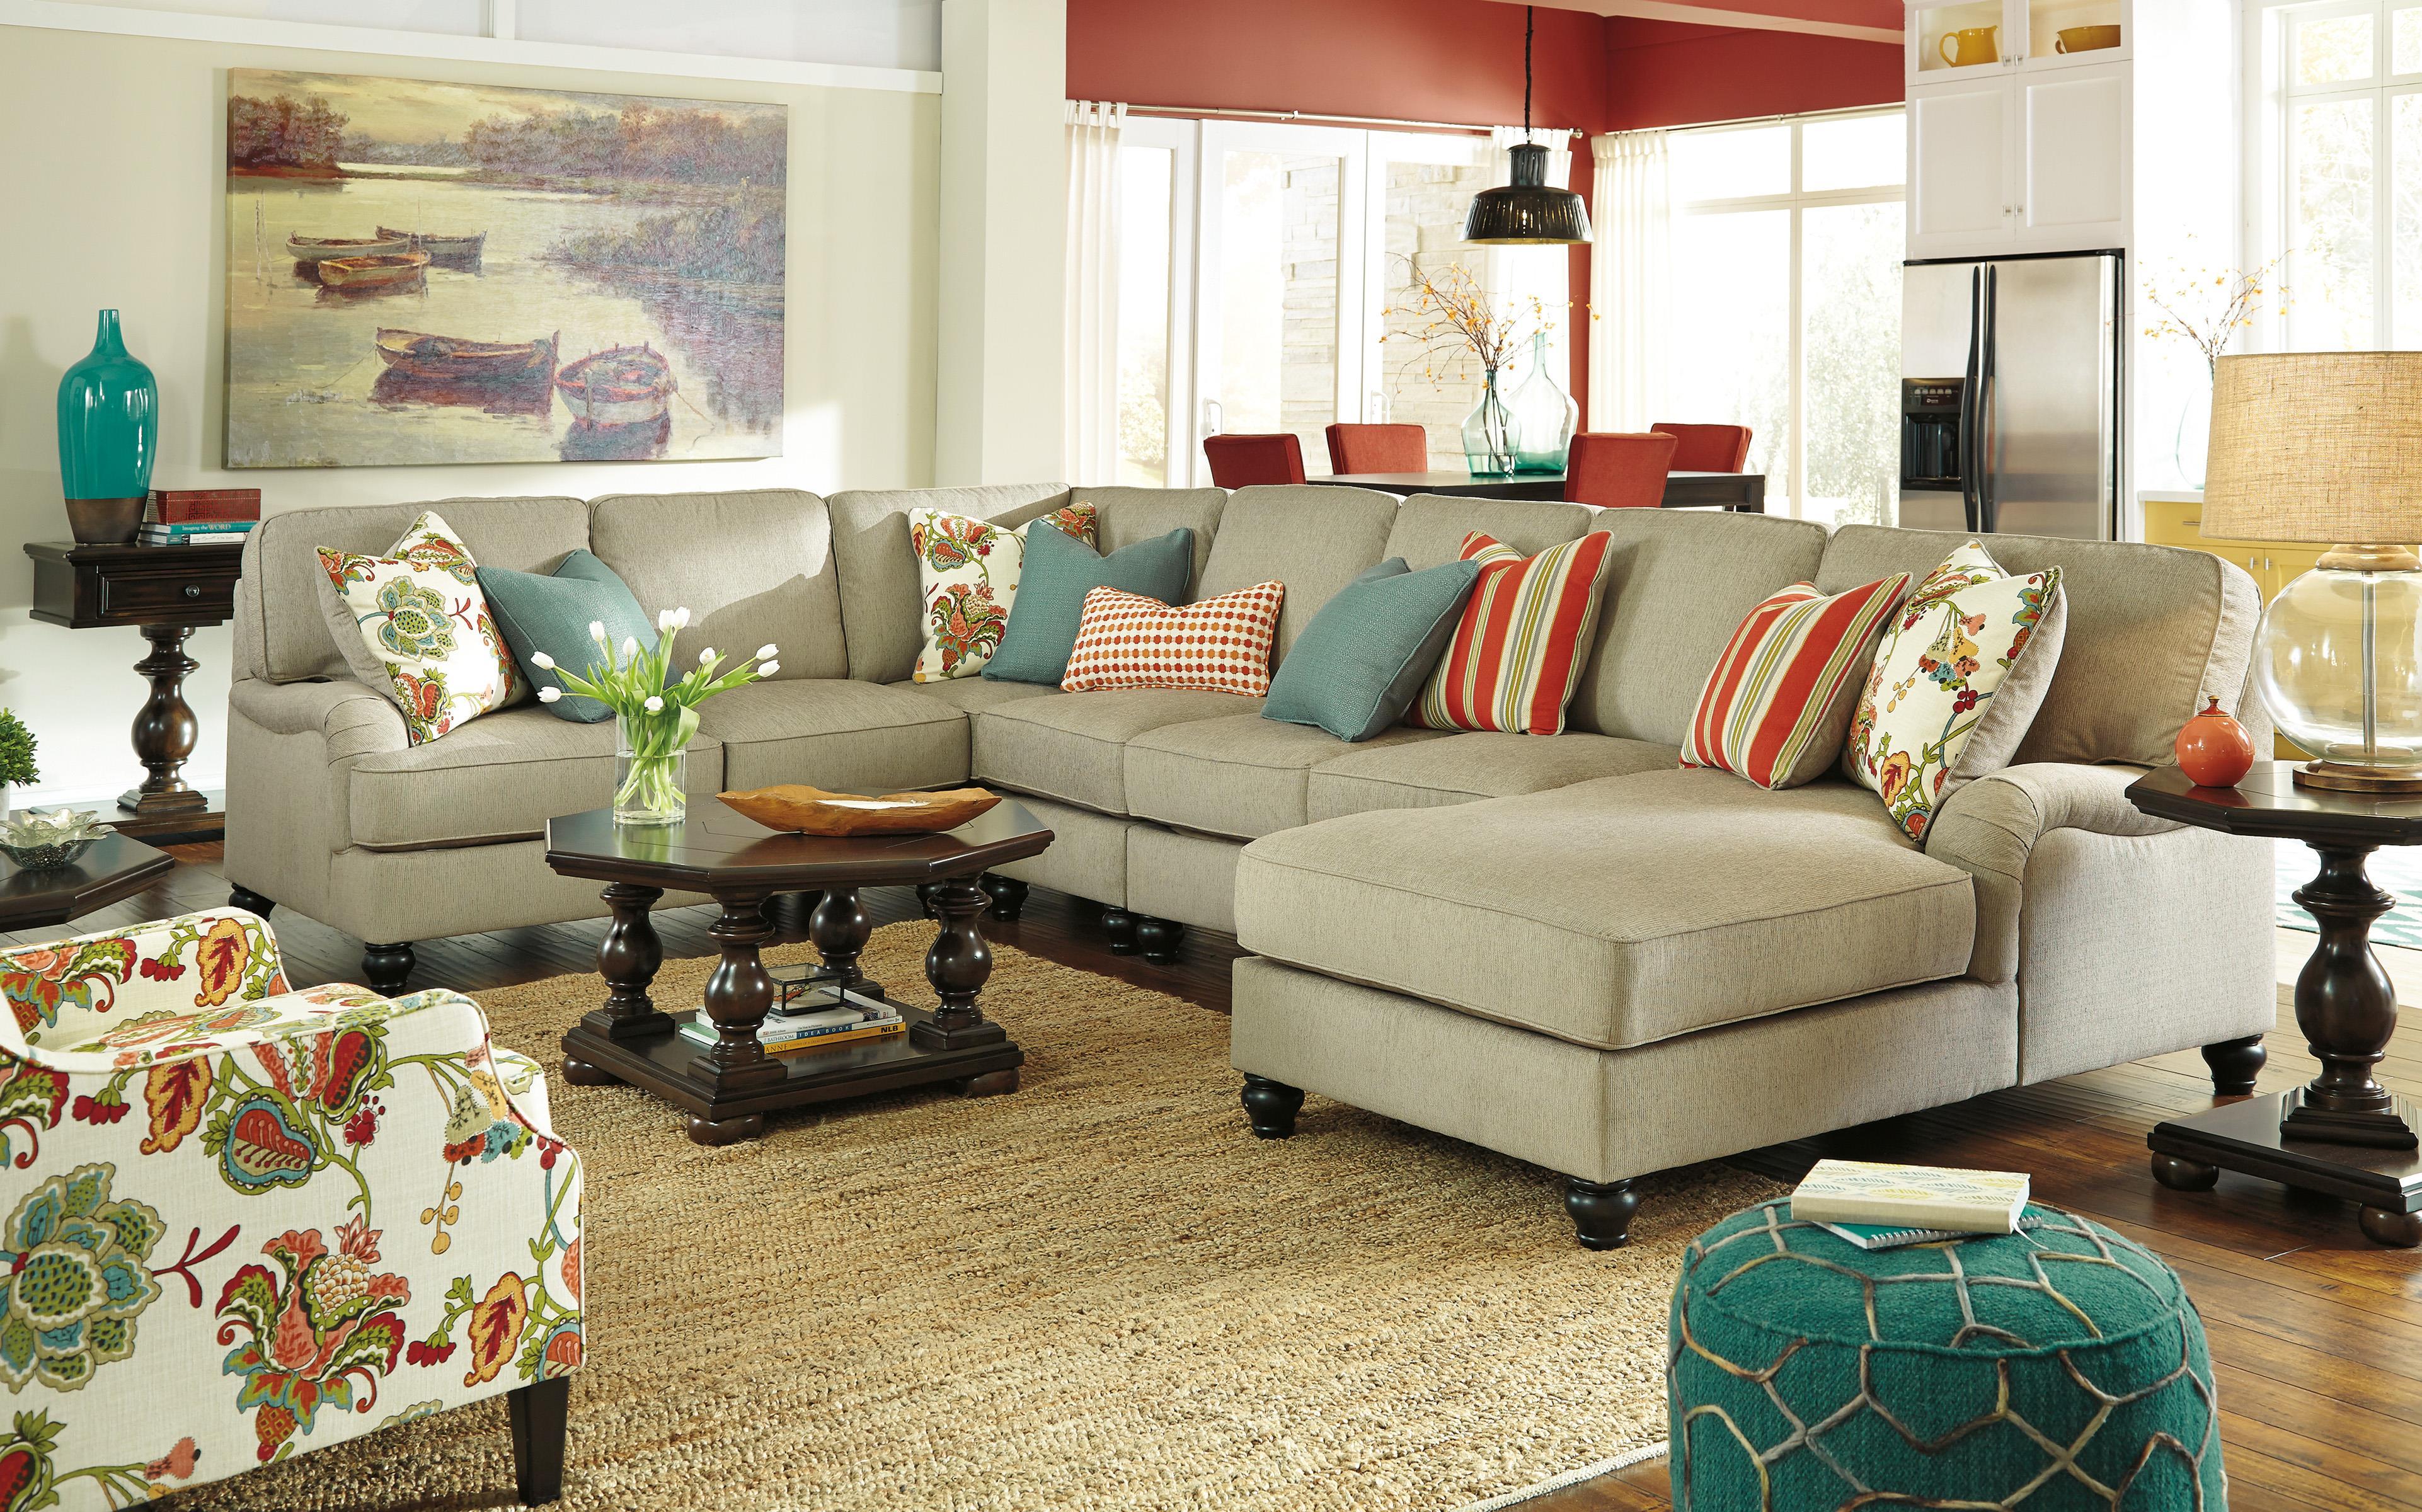 Ashley/Benchcraft Kerridon Stationary Living Room Group - Item Number: 26300 Living Room Group 14